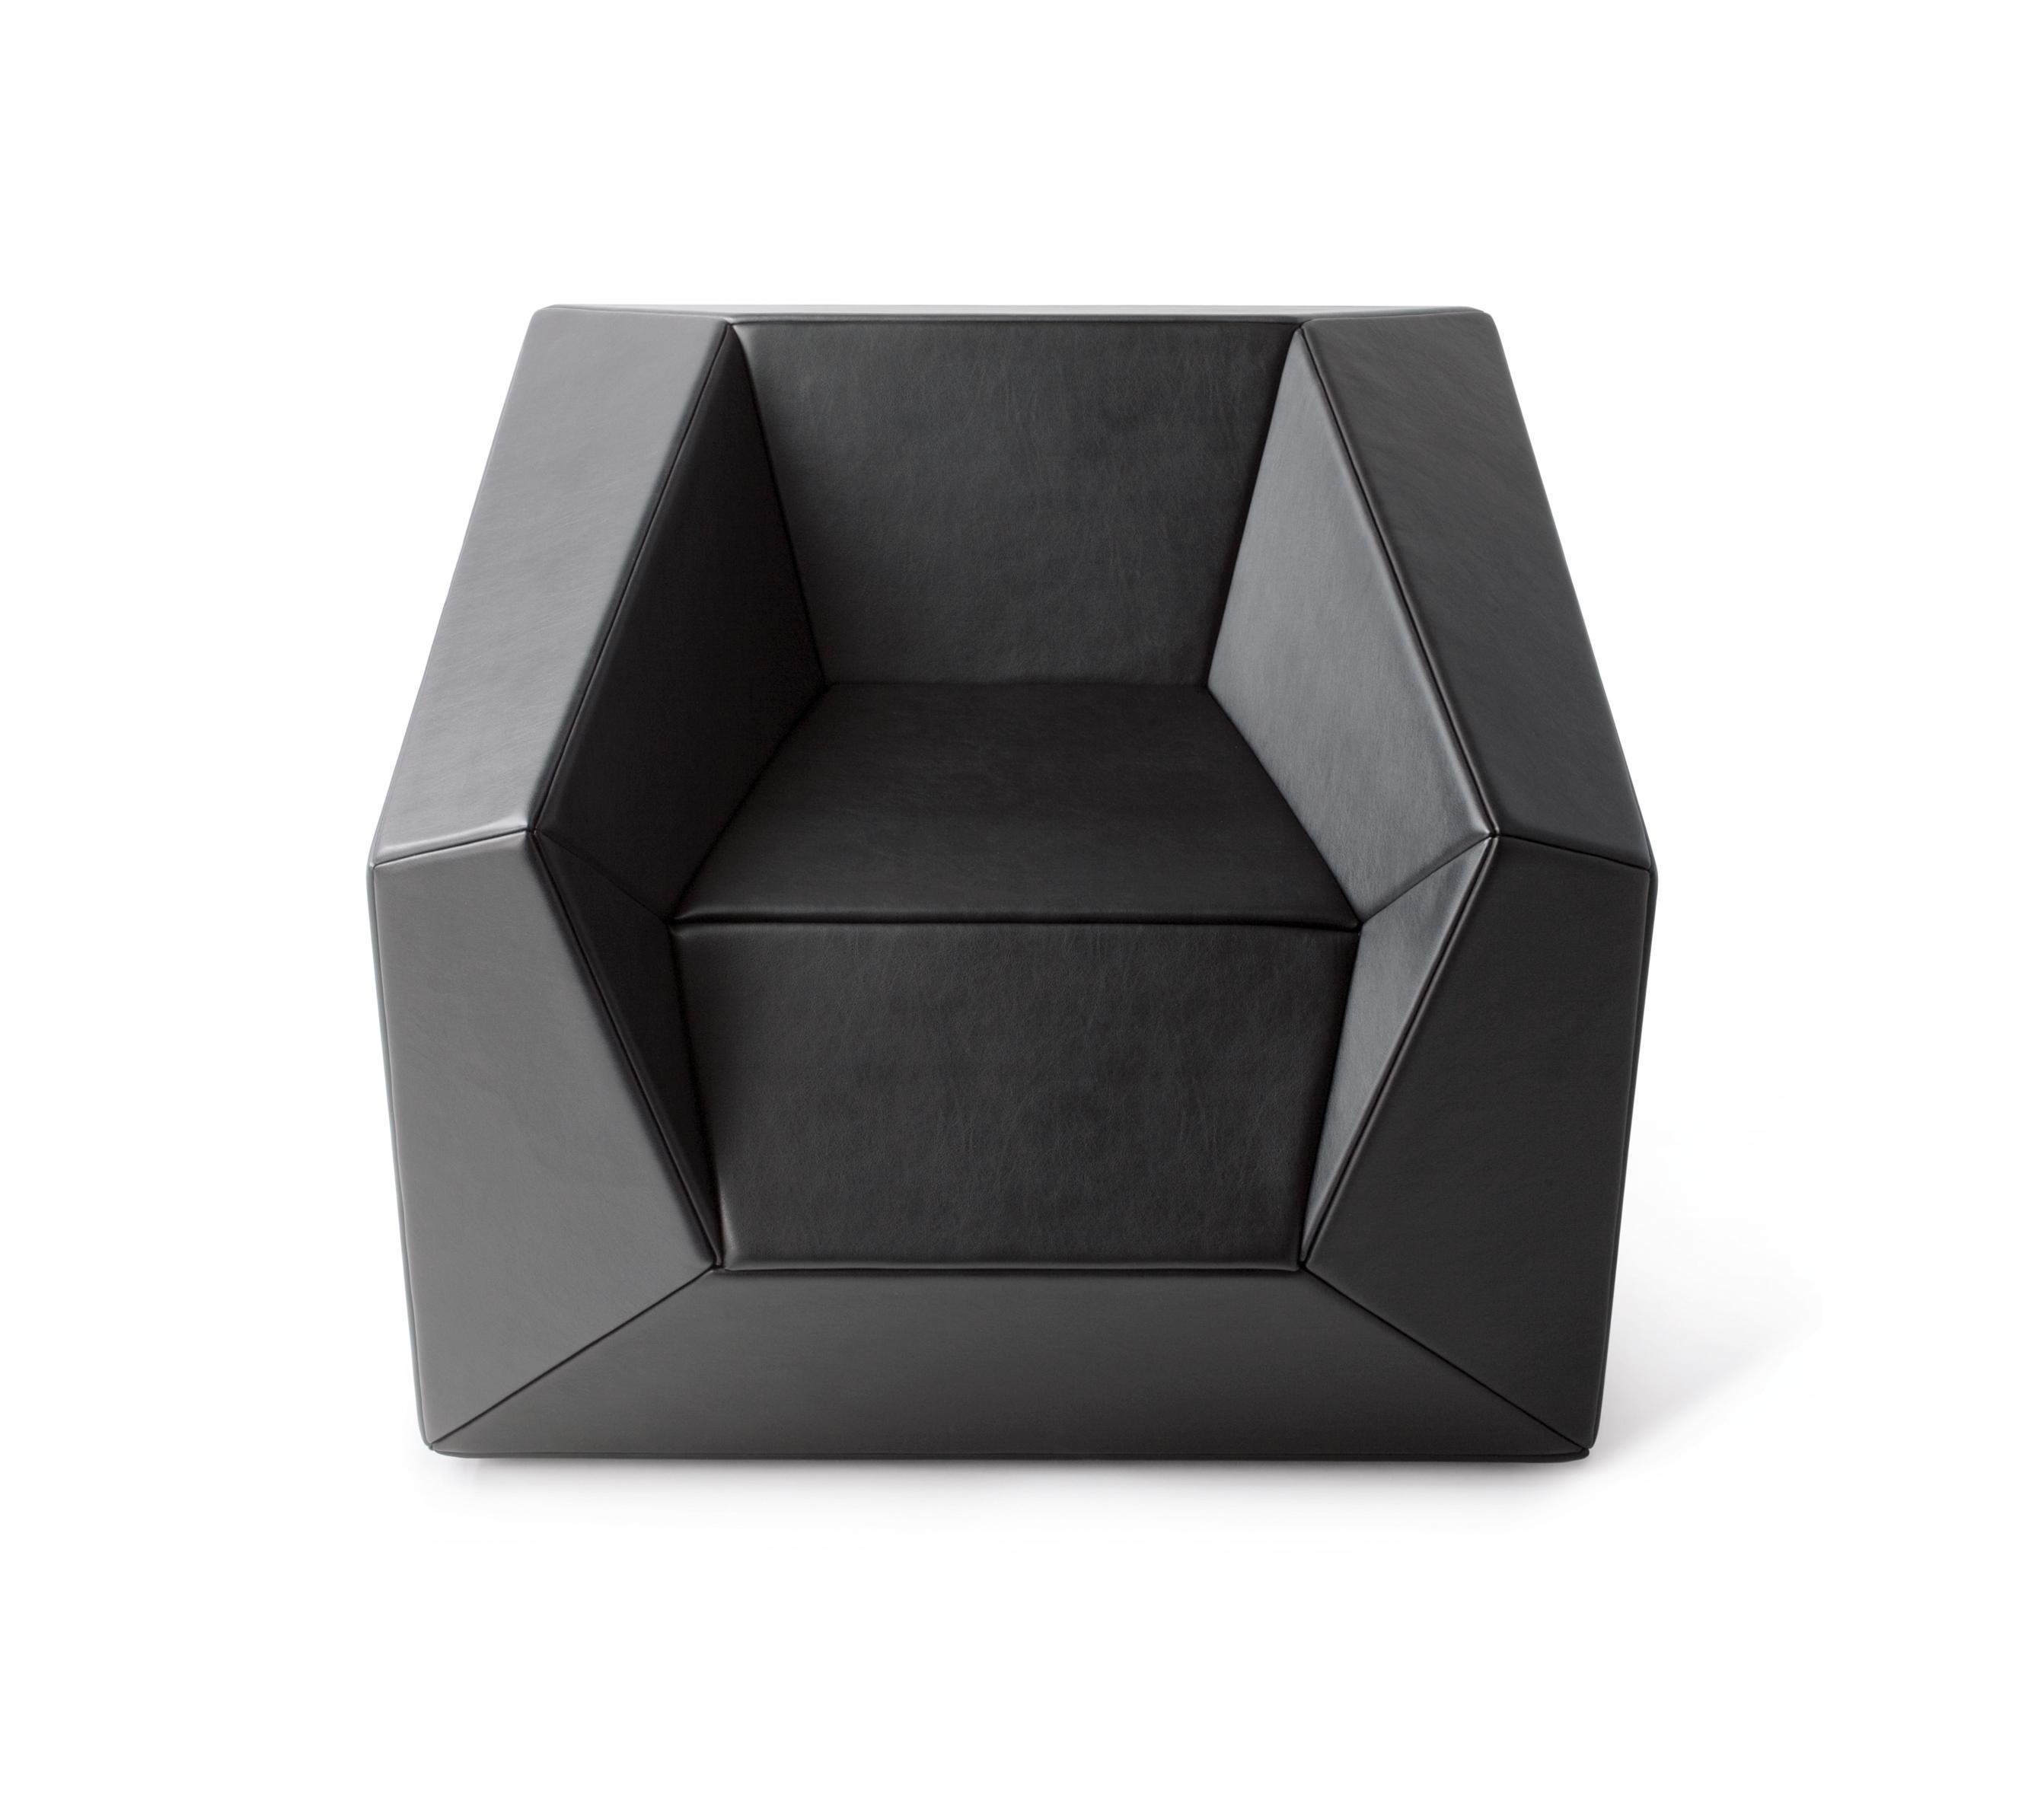 Thomas Feichtner - FX10 Lounge Chair